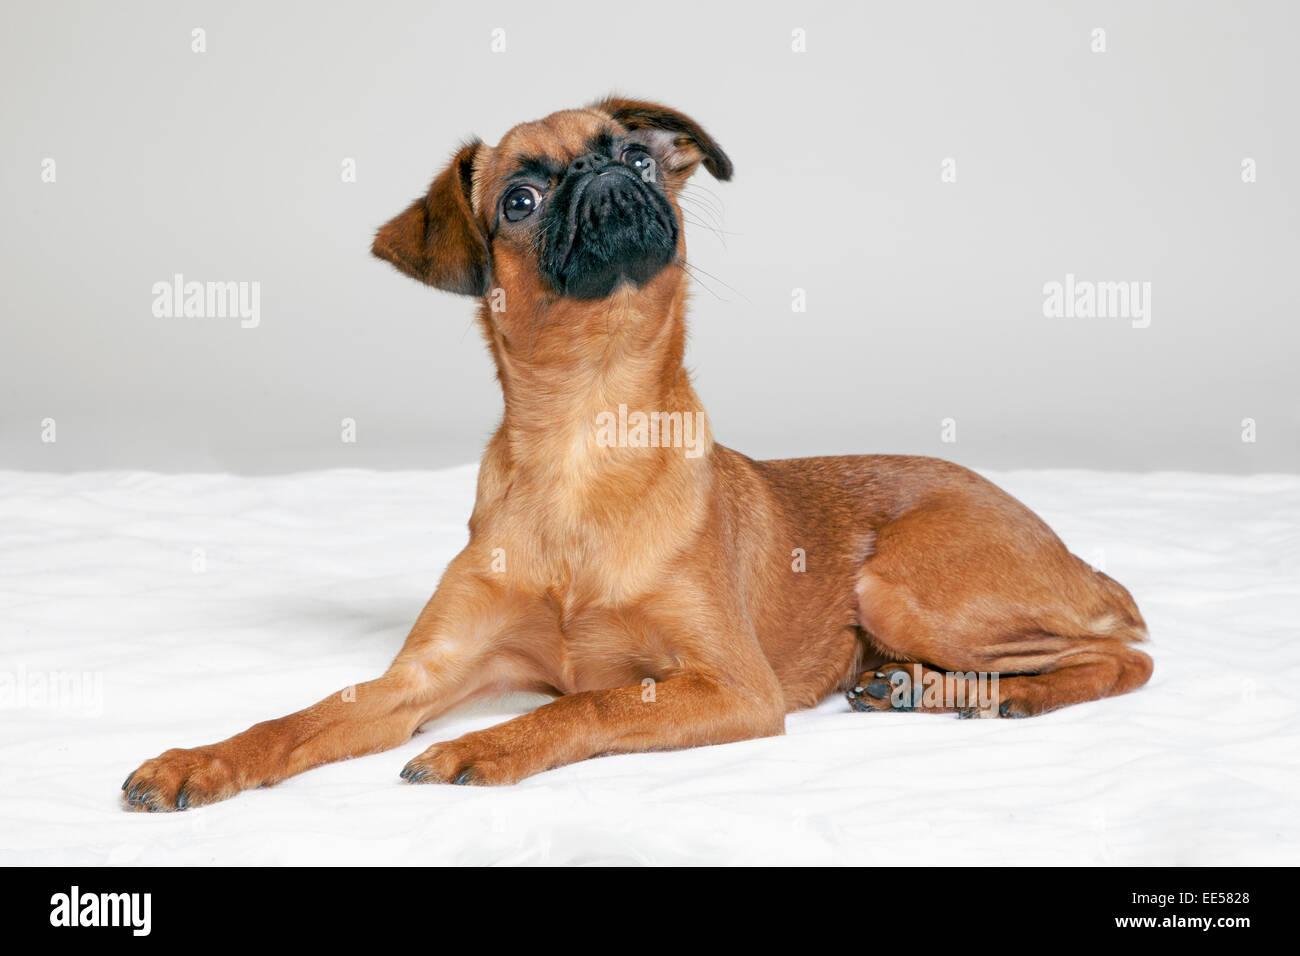 Brussels griffon on white shag carpet - Stock Image